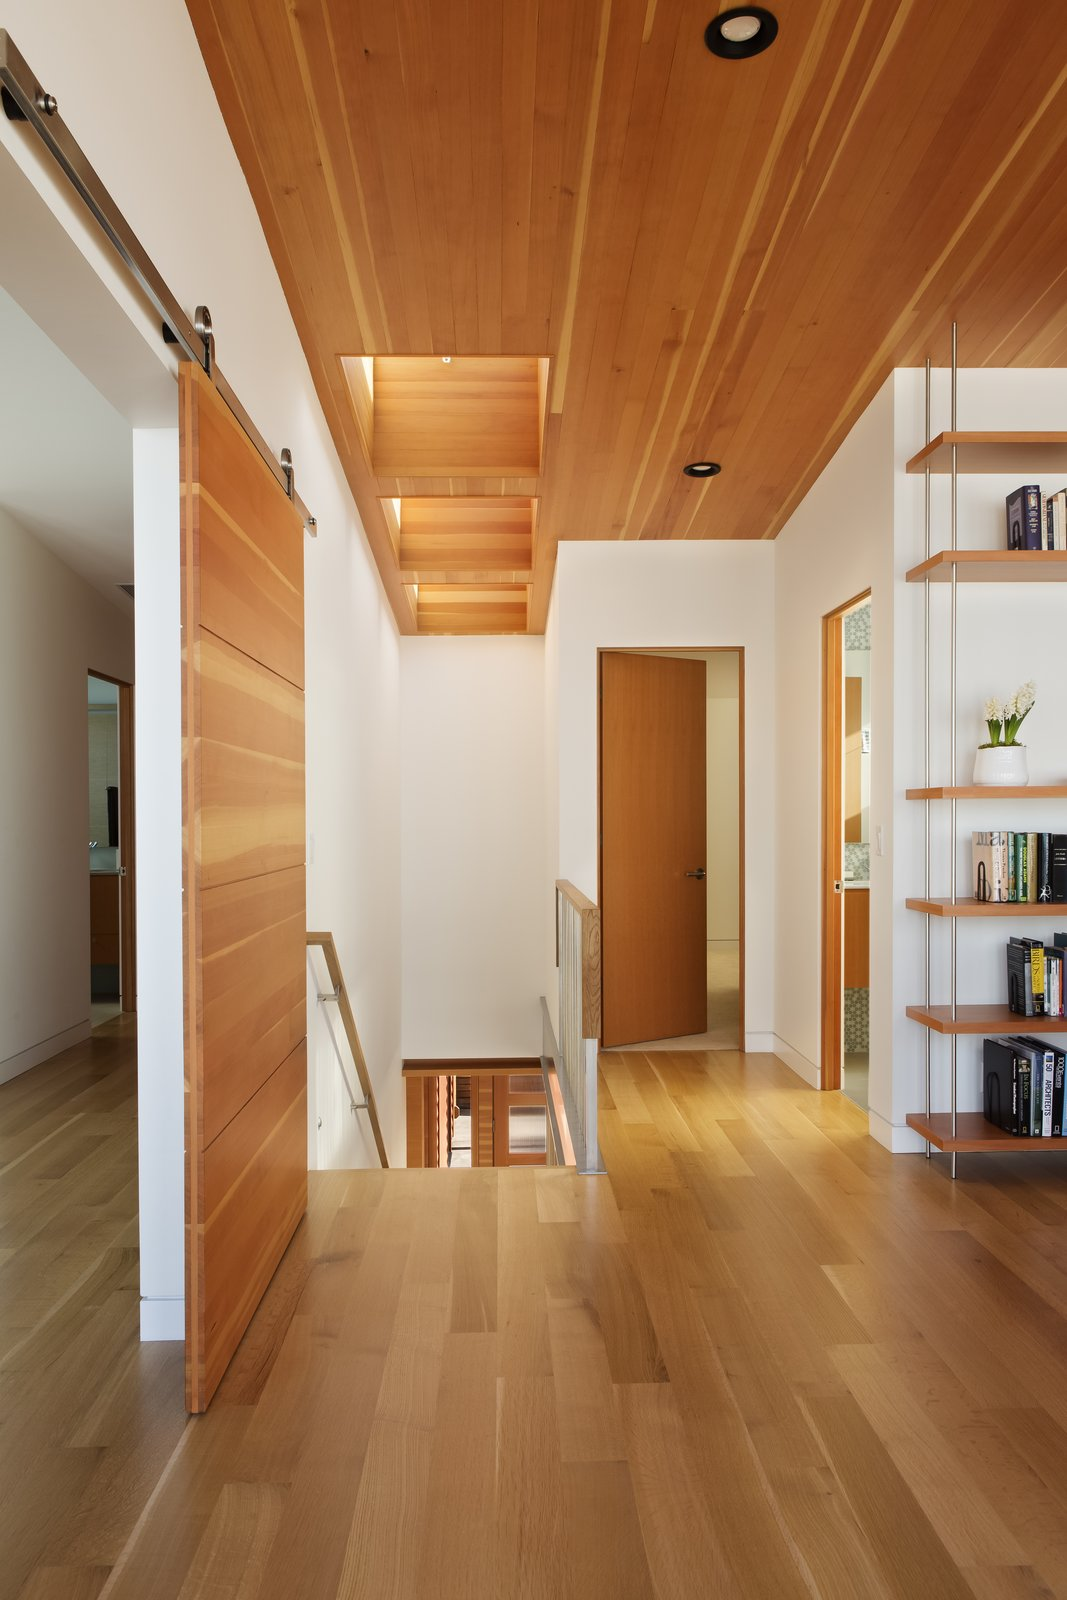 Loft  Roads End Beach House by Giulietti / Schouten AIA Architects